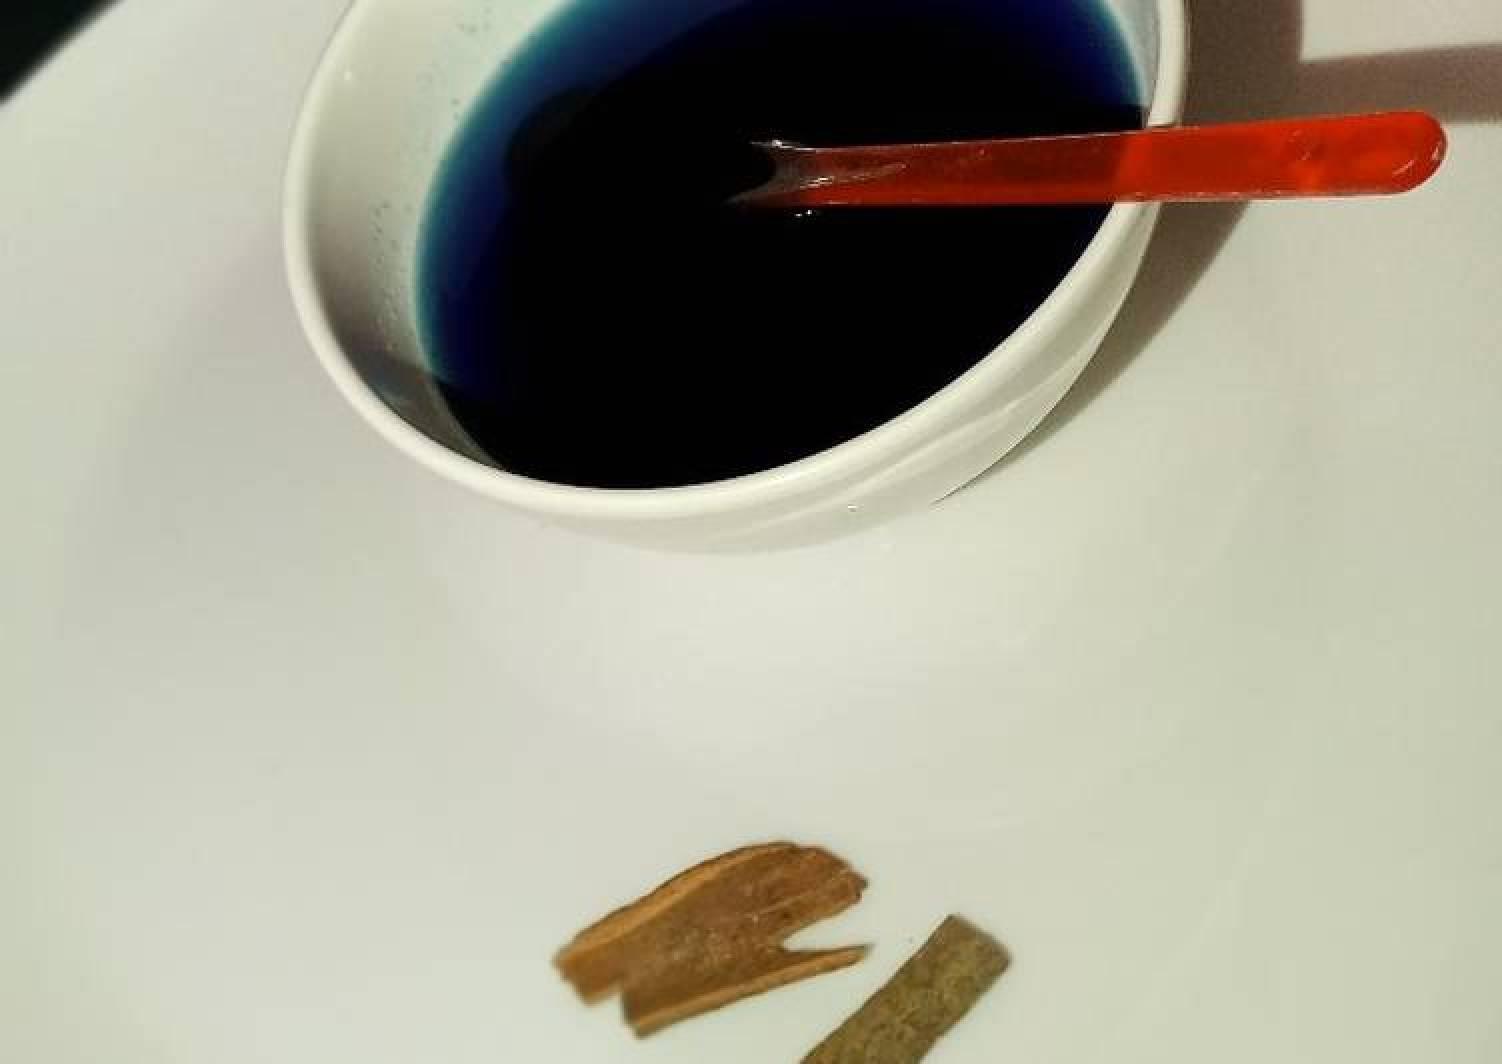 Homemade Blue Curacao syrup